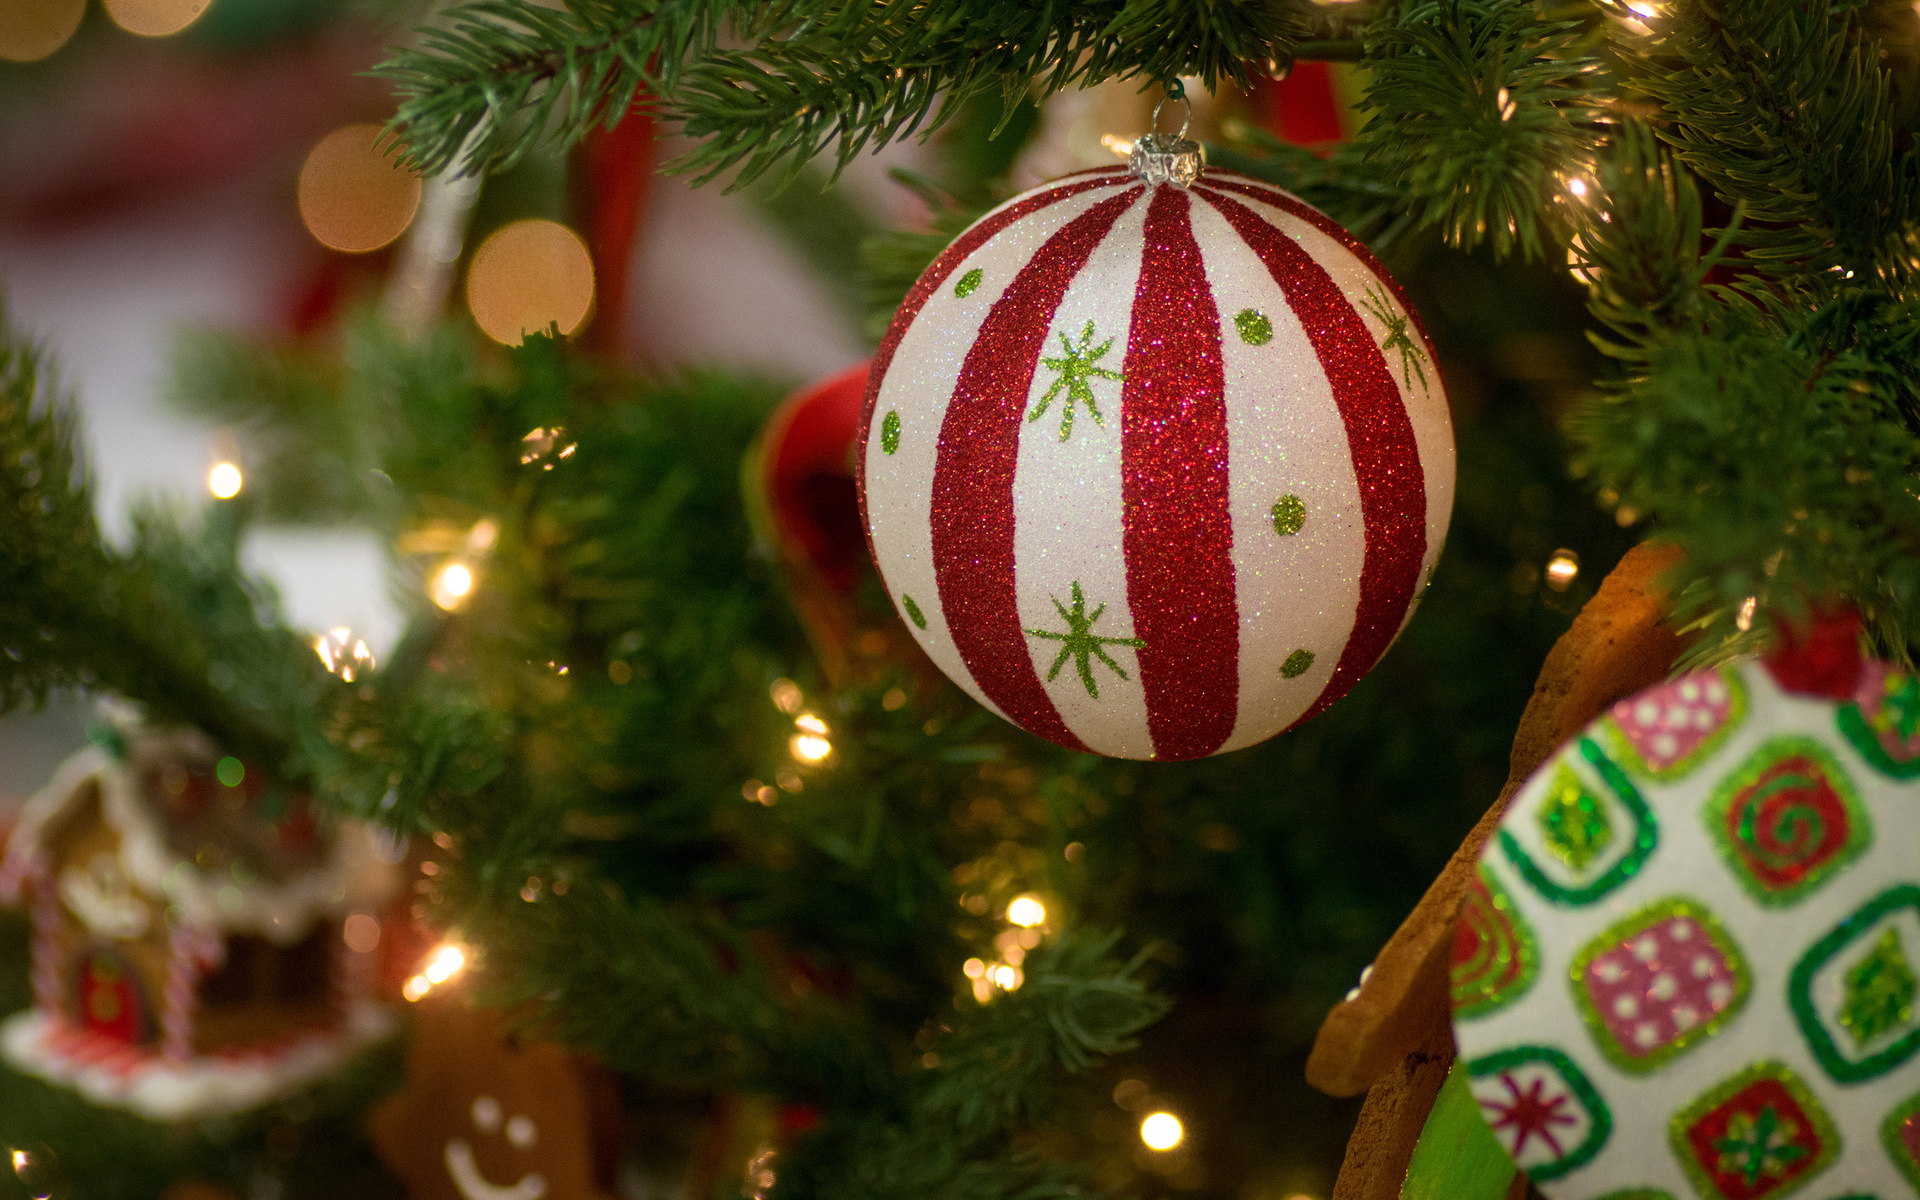 Pretty Christmas Ornaments Wallpaper 38742 1920x1080 px